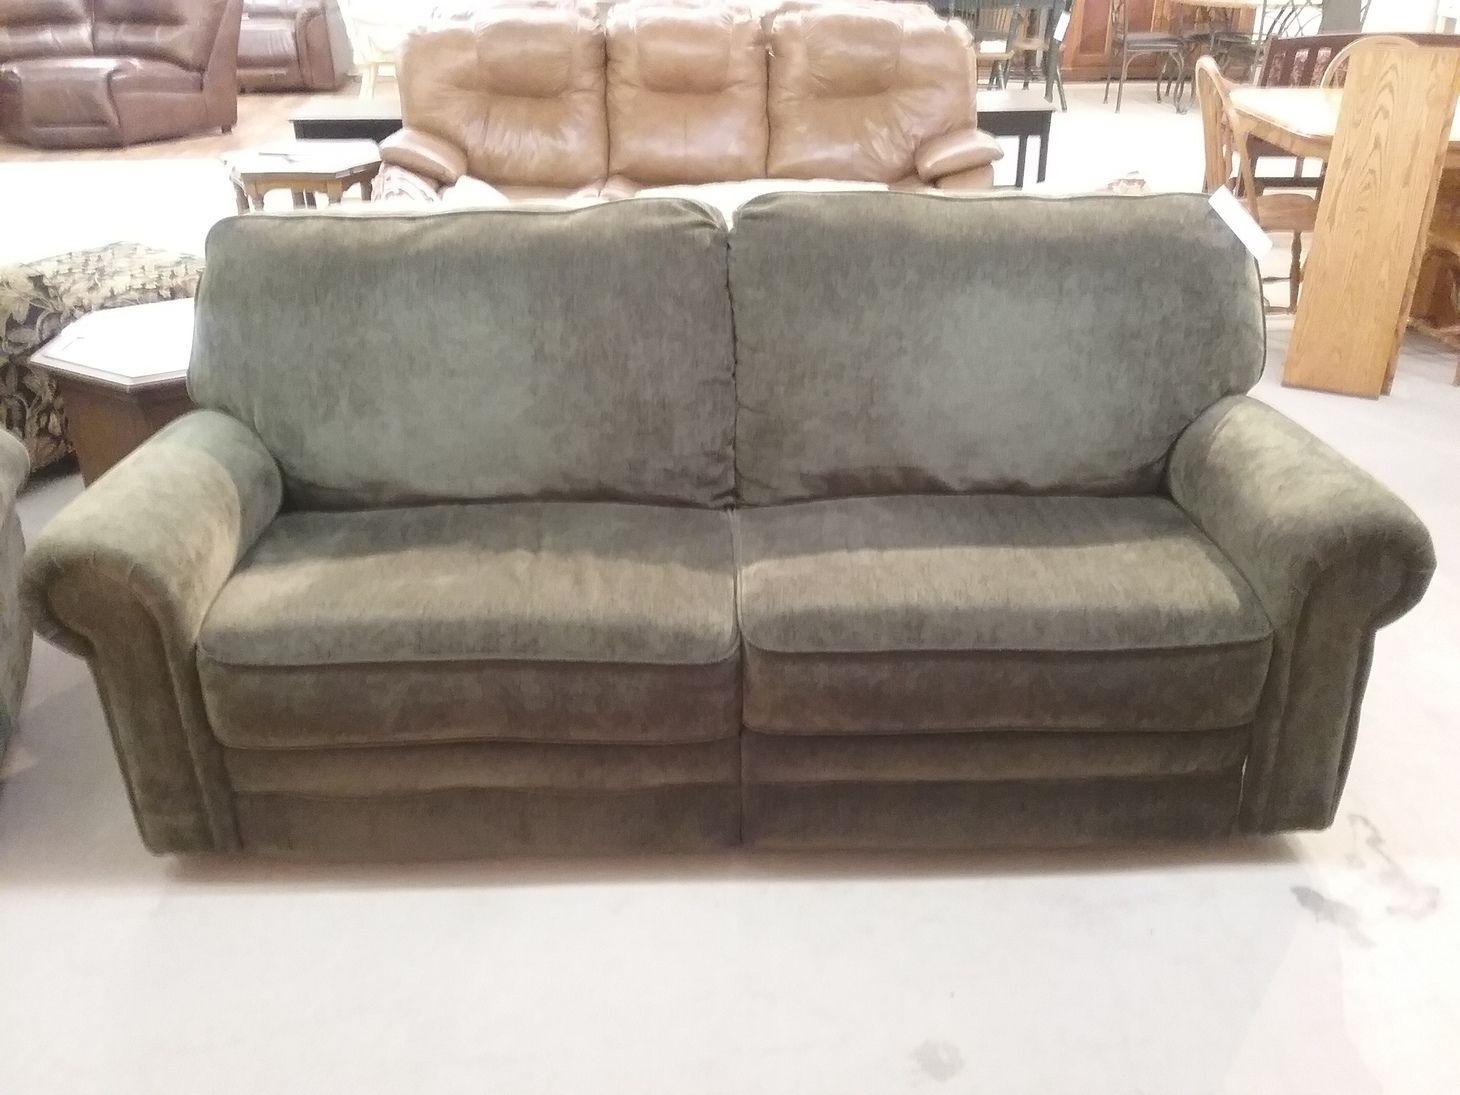 Green Berkline Reclining Sofa Delmarva Furniture Consignment